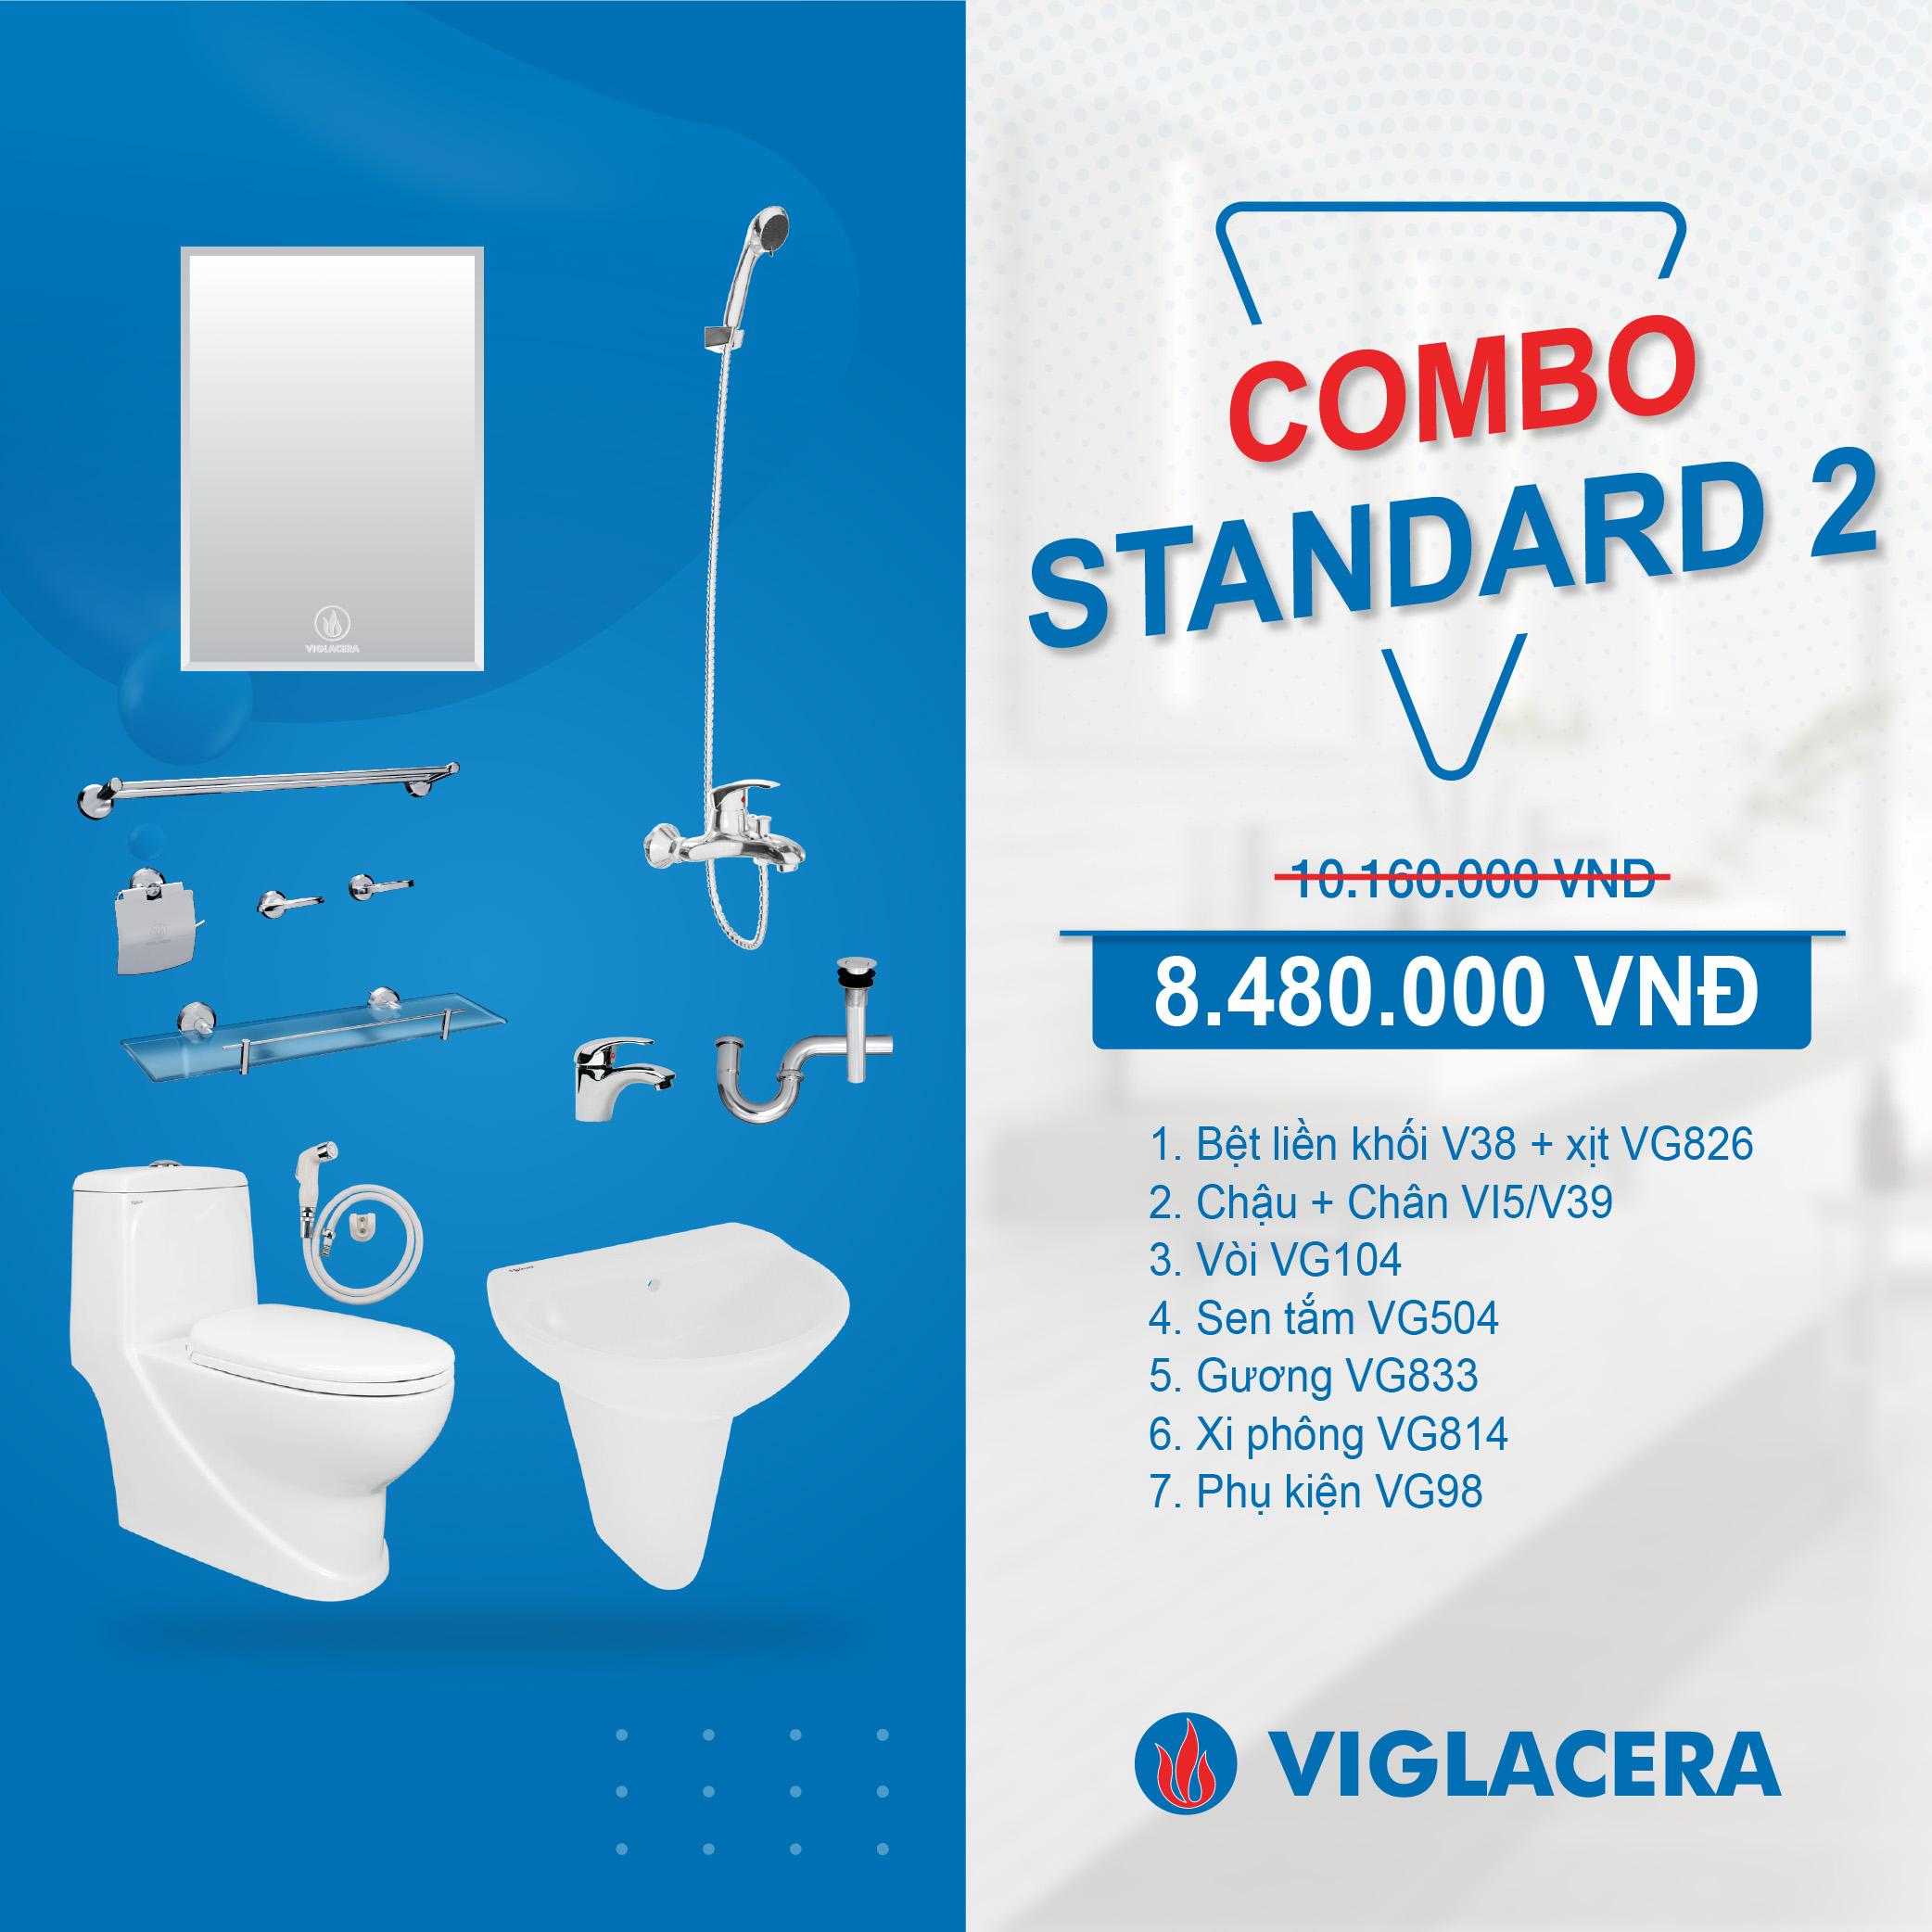 Combo Viglacera Standard 2